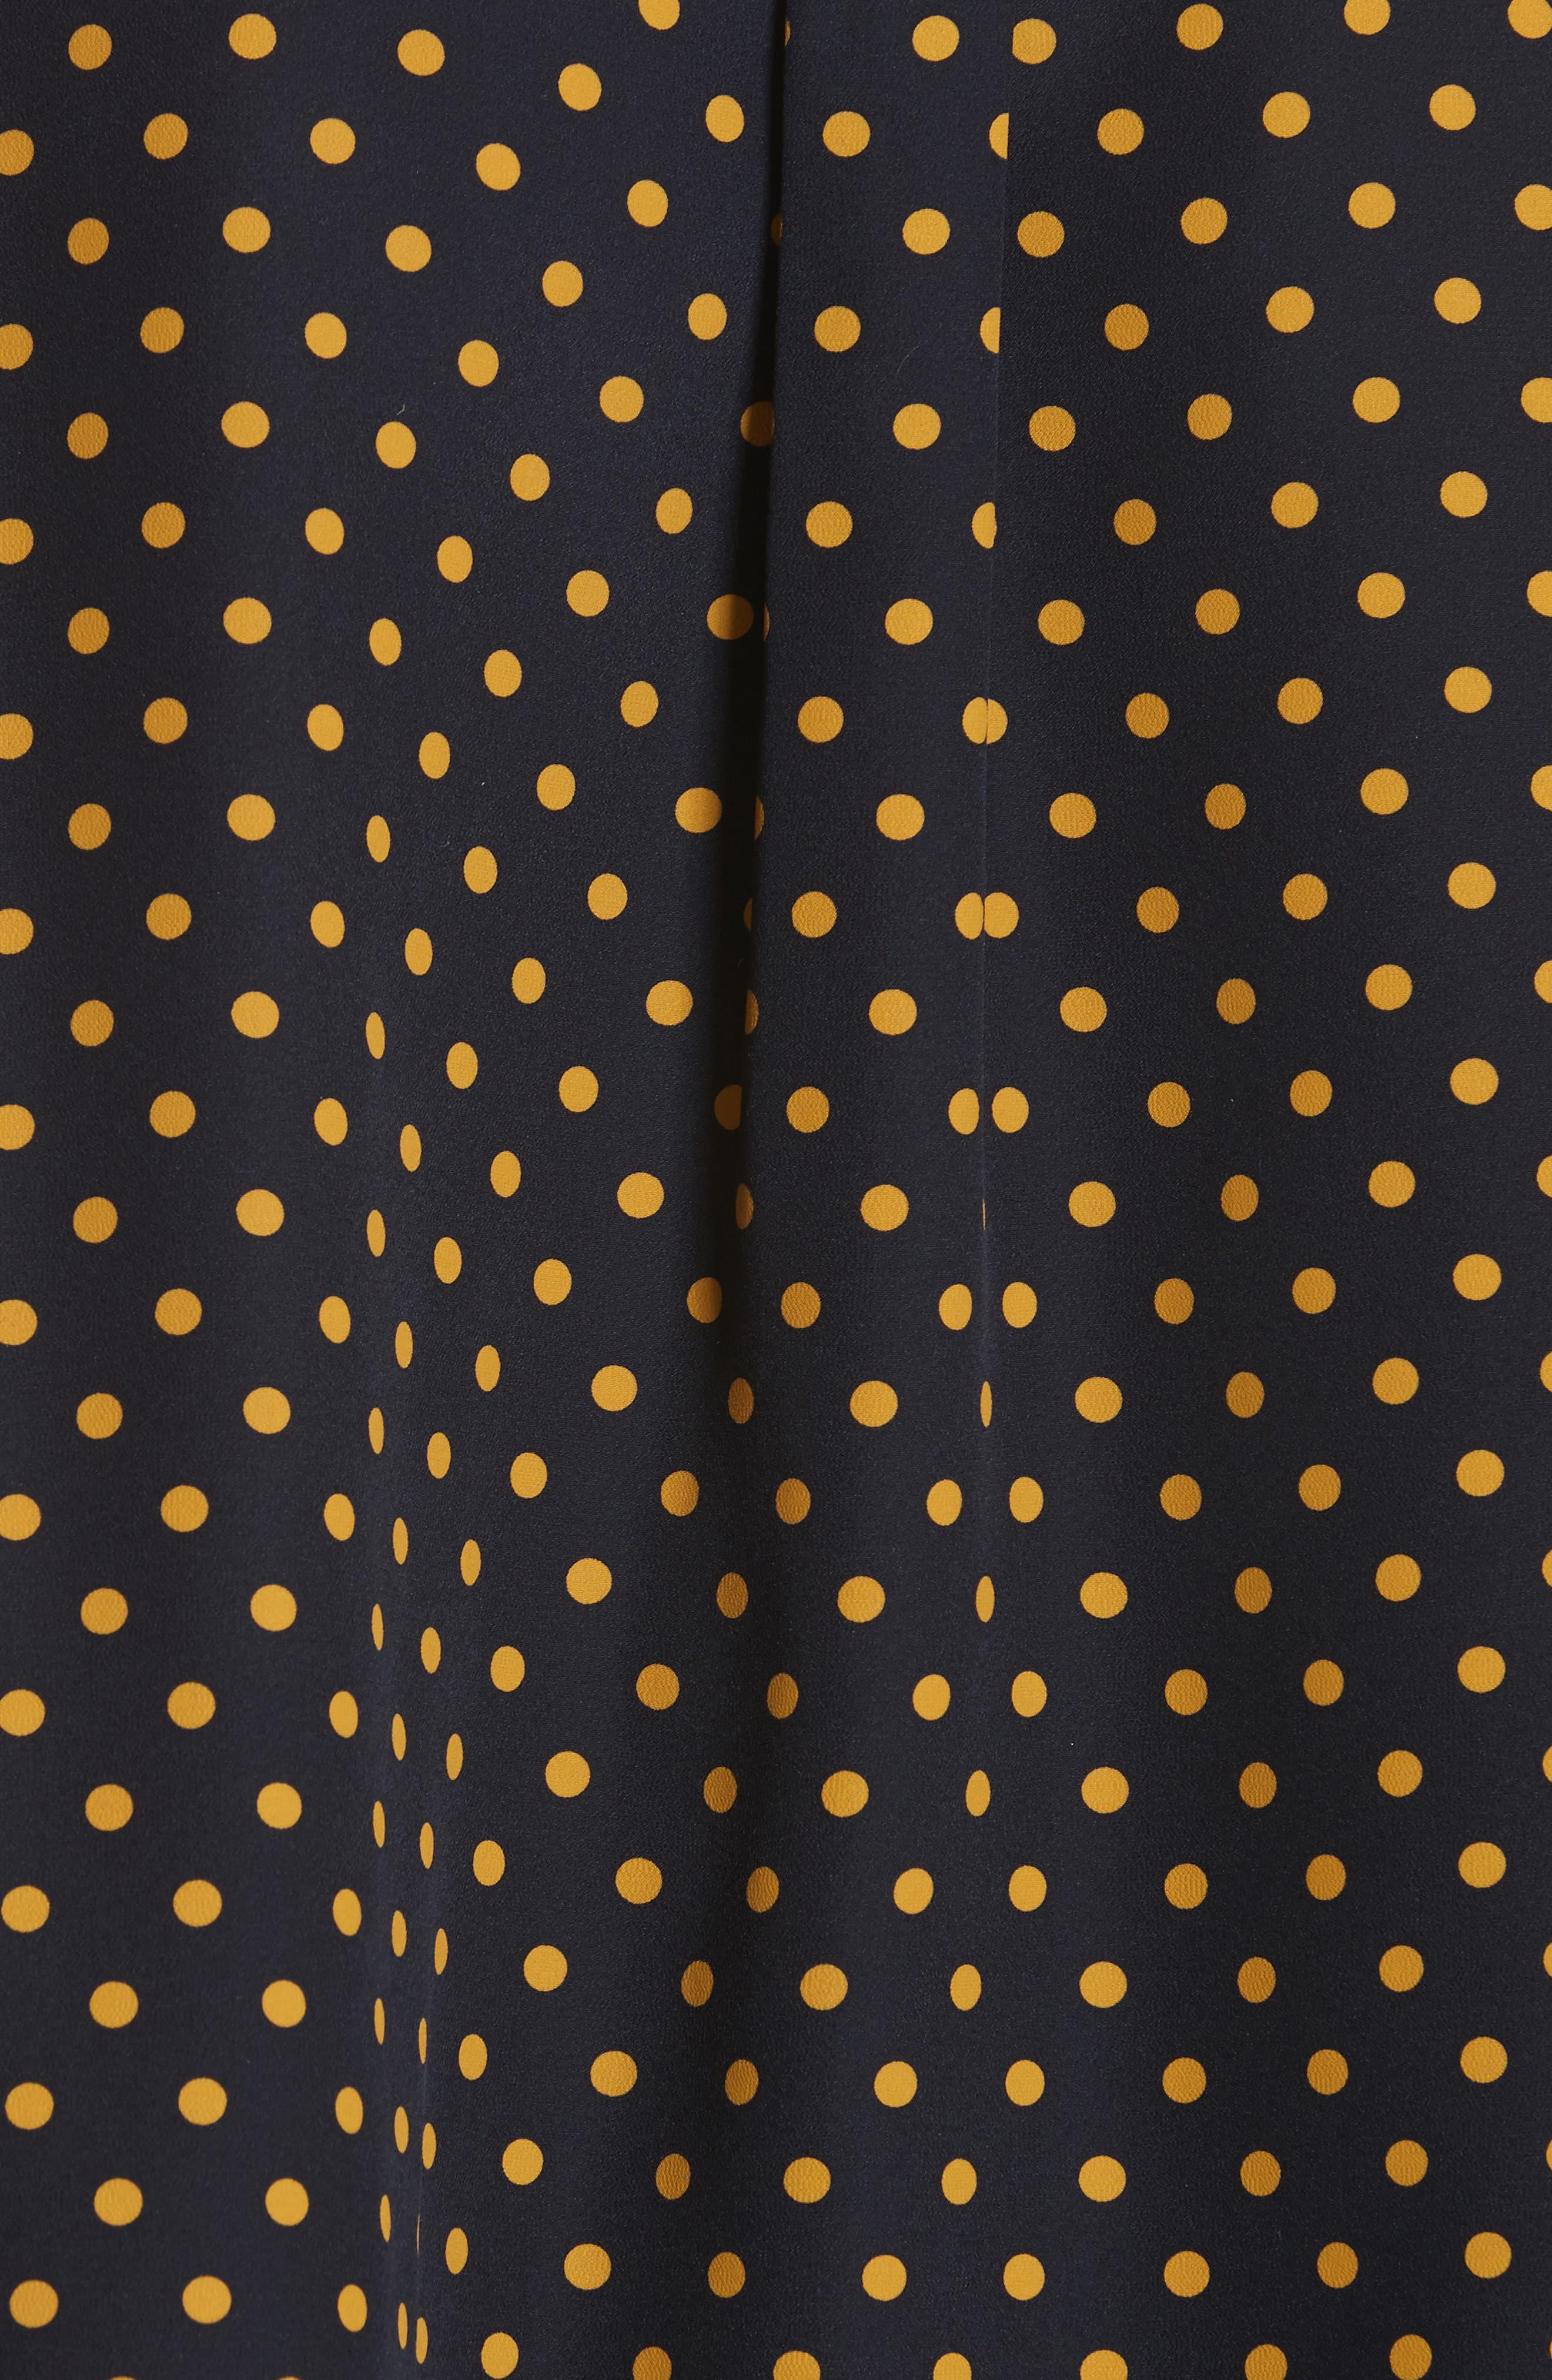 Garcon-Laura Dotted Silk Shirt,                             Alternate thumbnail 5, color,                             Navy